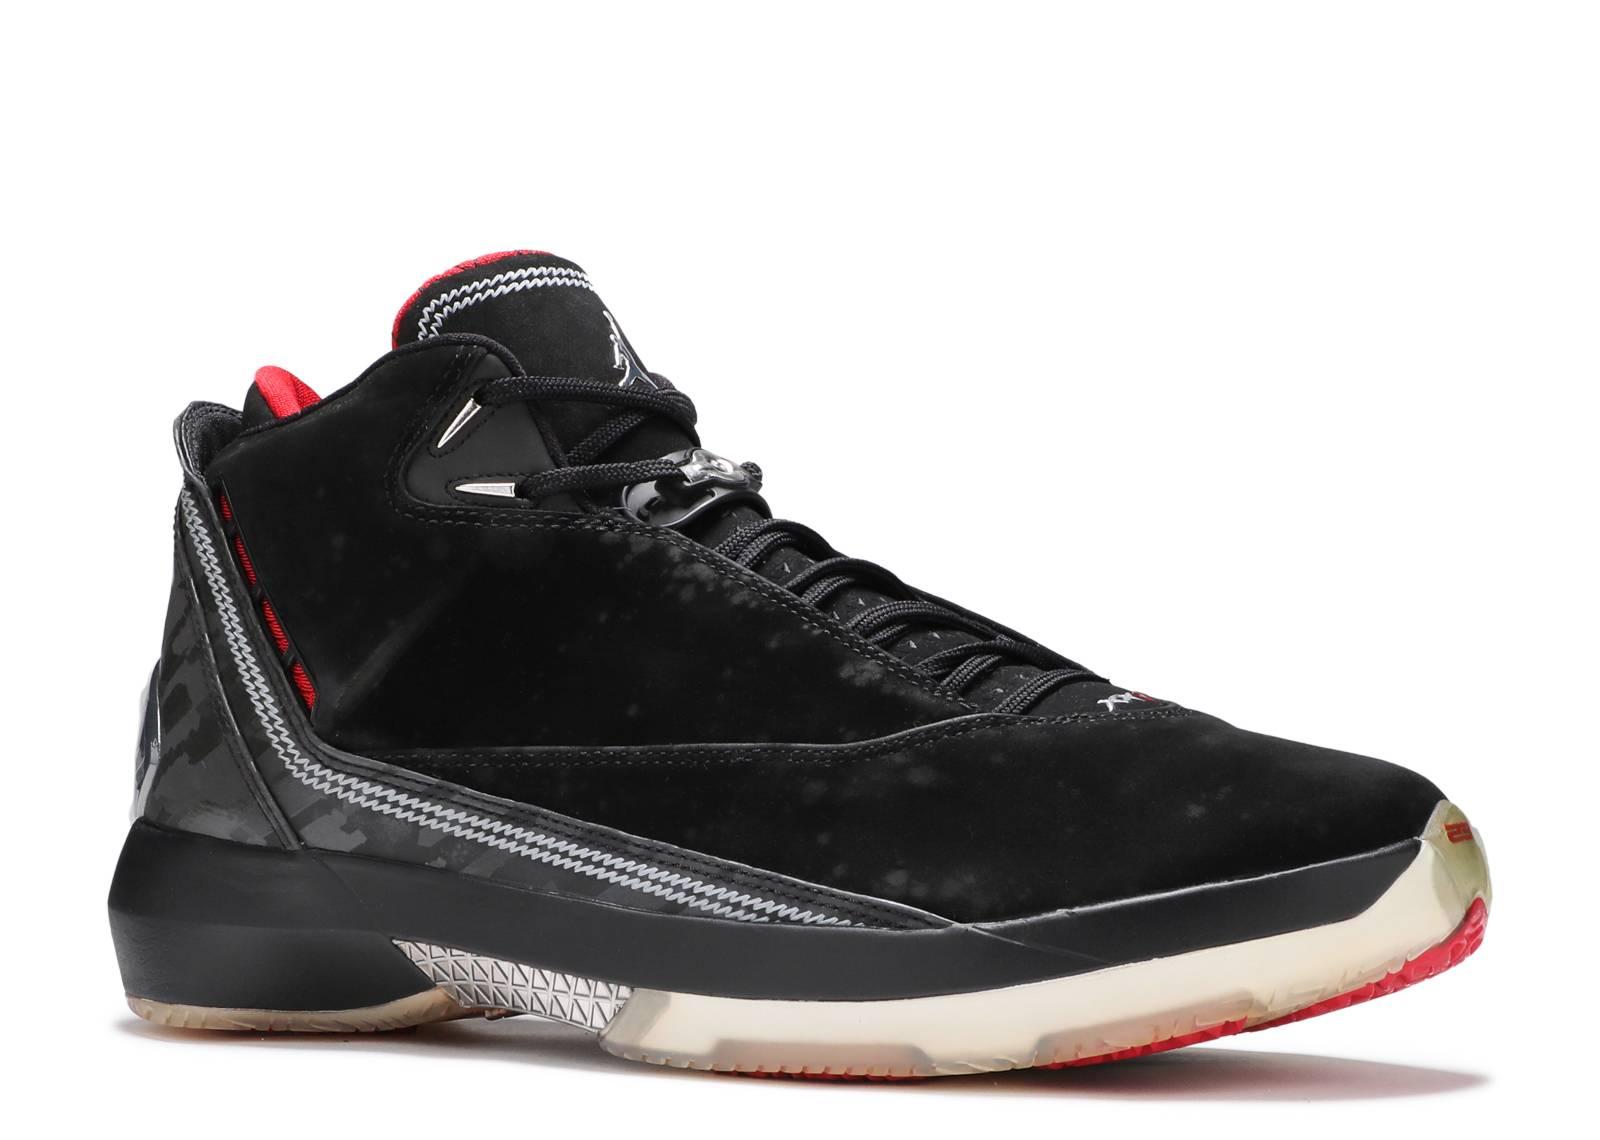 60e5c0231bdfd9 Air Jordan 22 - Air Jordan - 315299 001 - black varsity red-metallic silver